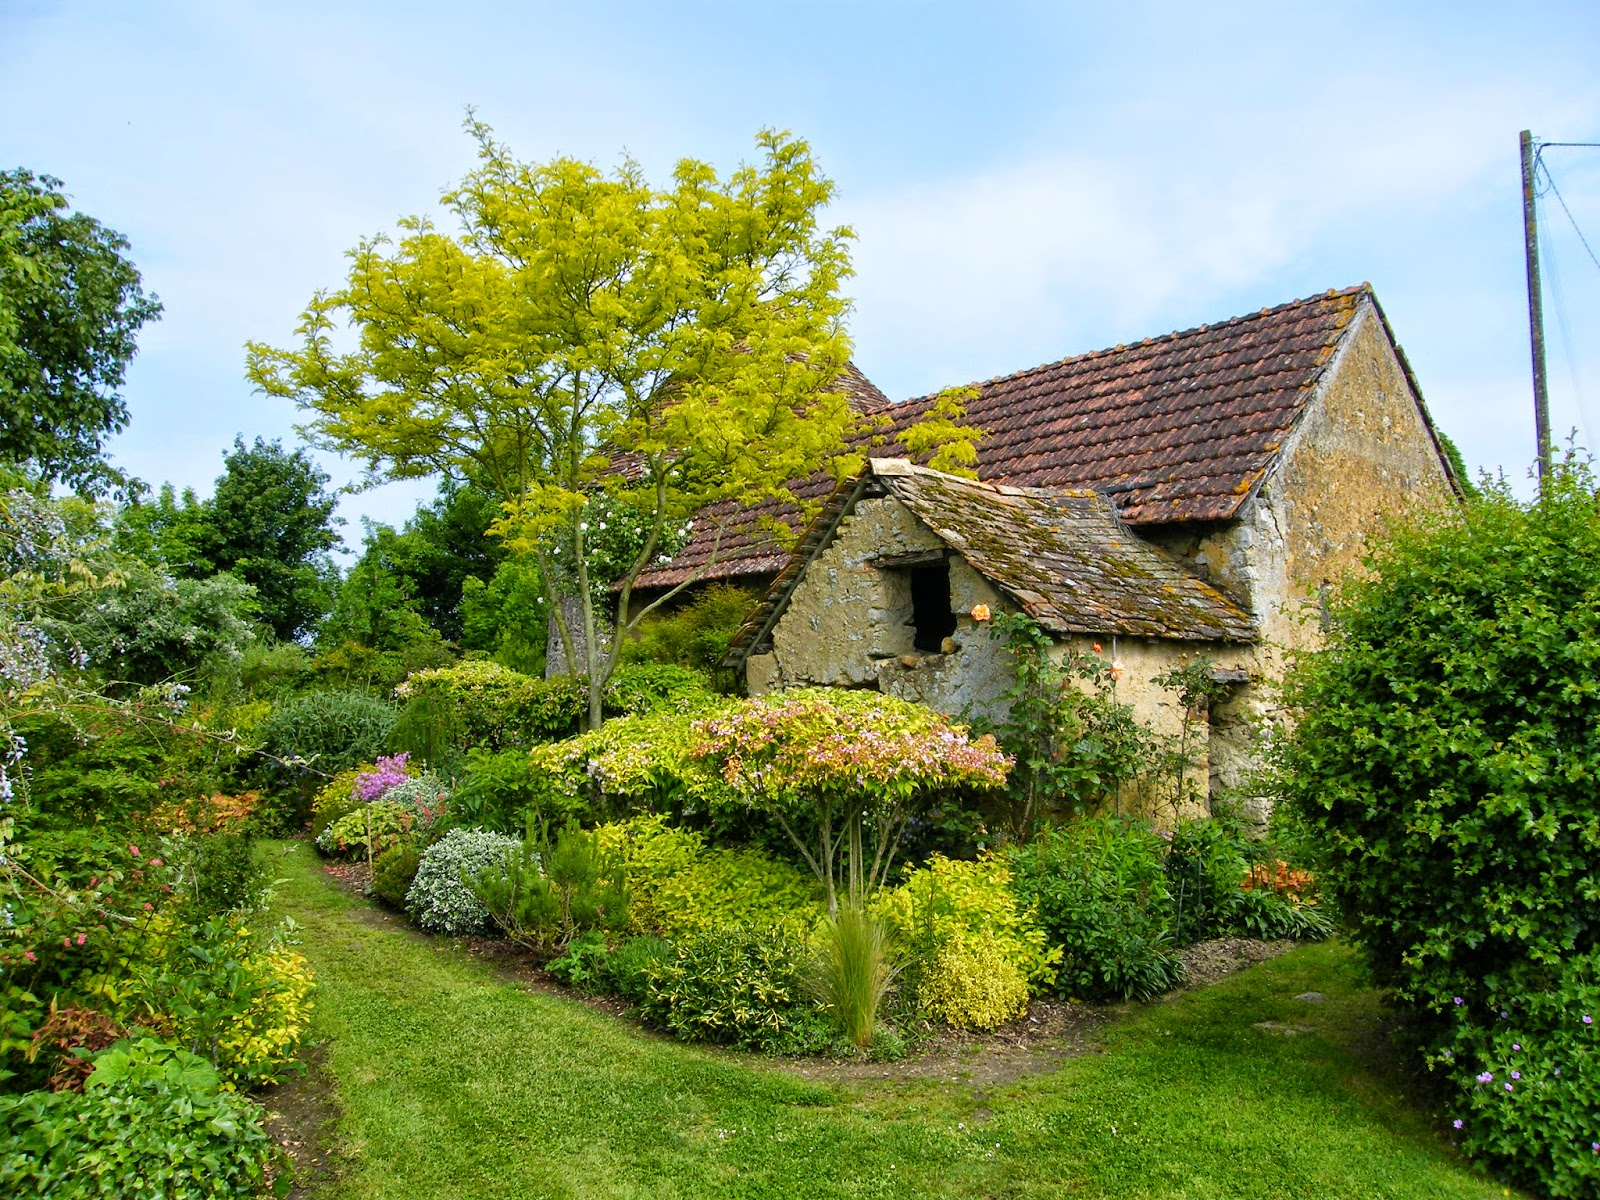 Au gr du jardin un jardin audacieux for Le jardin imaginaire